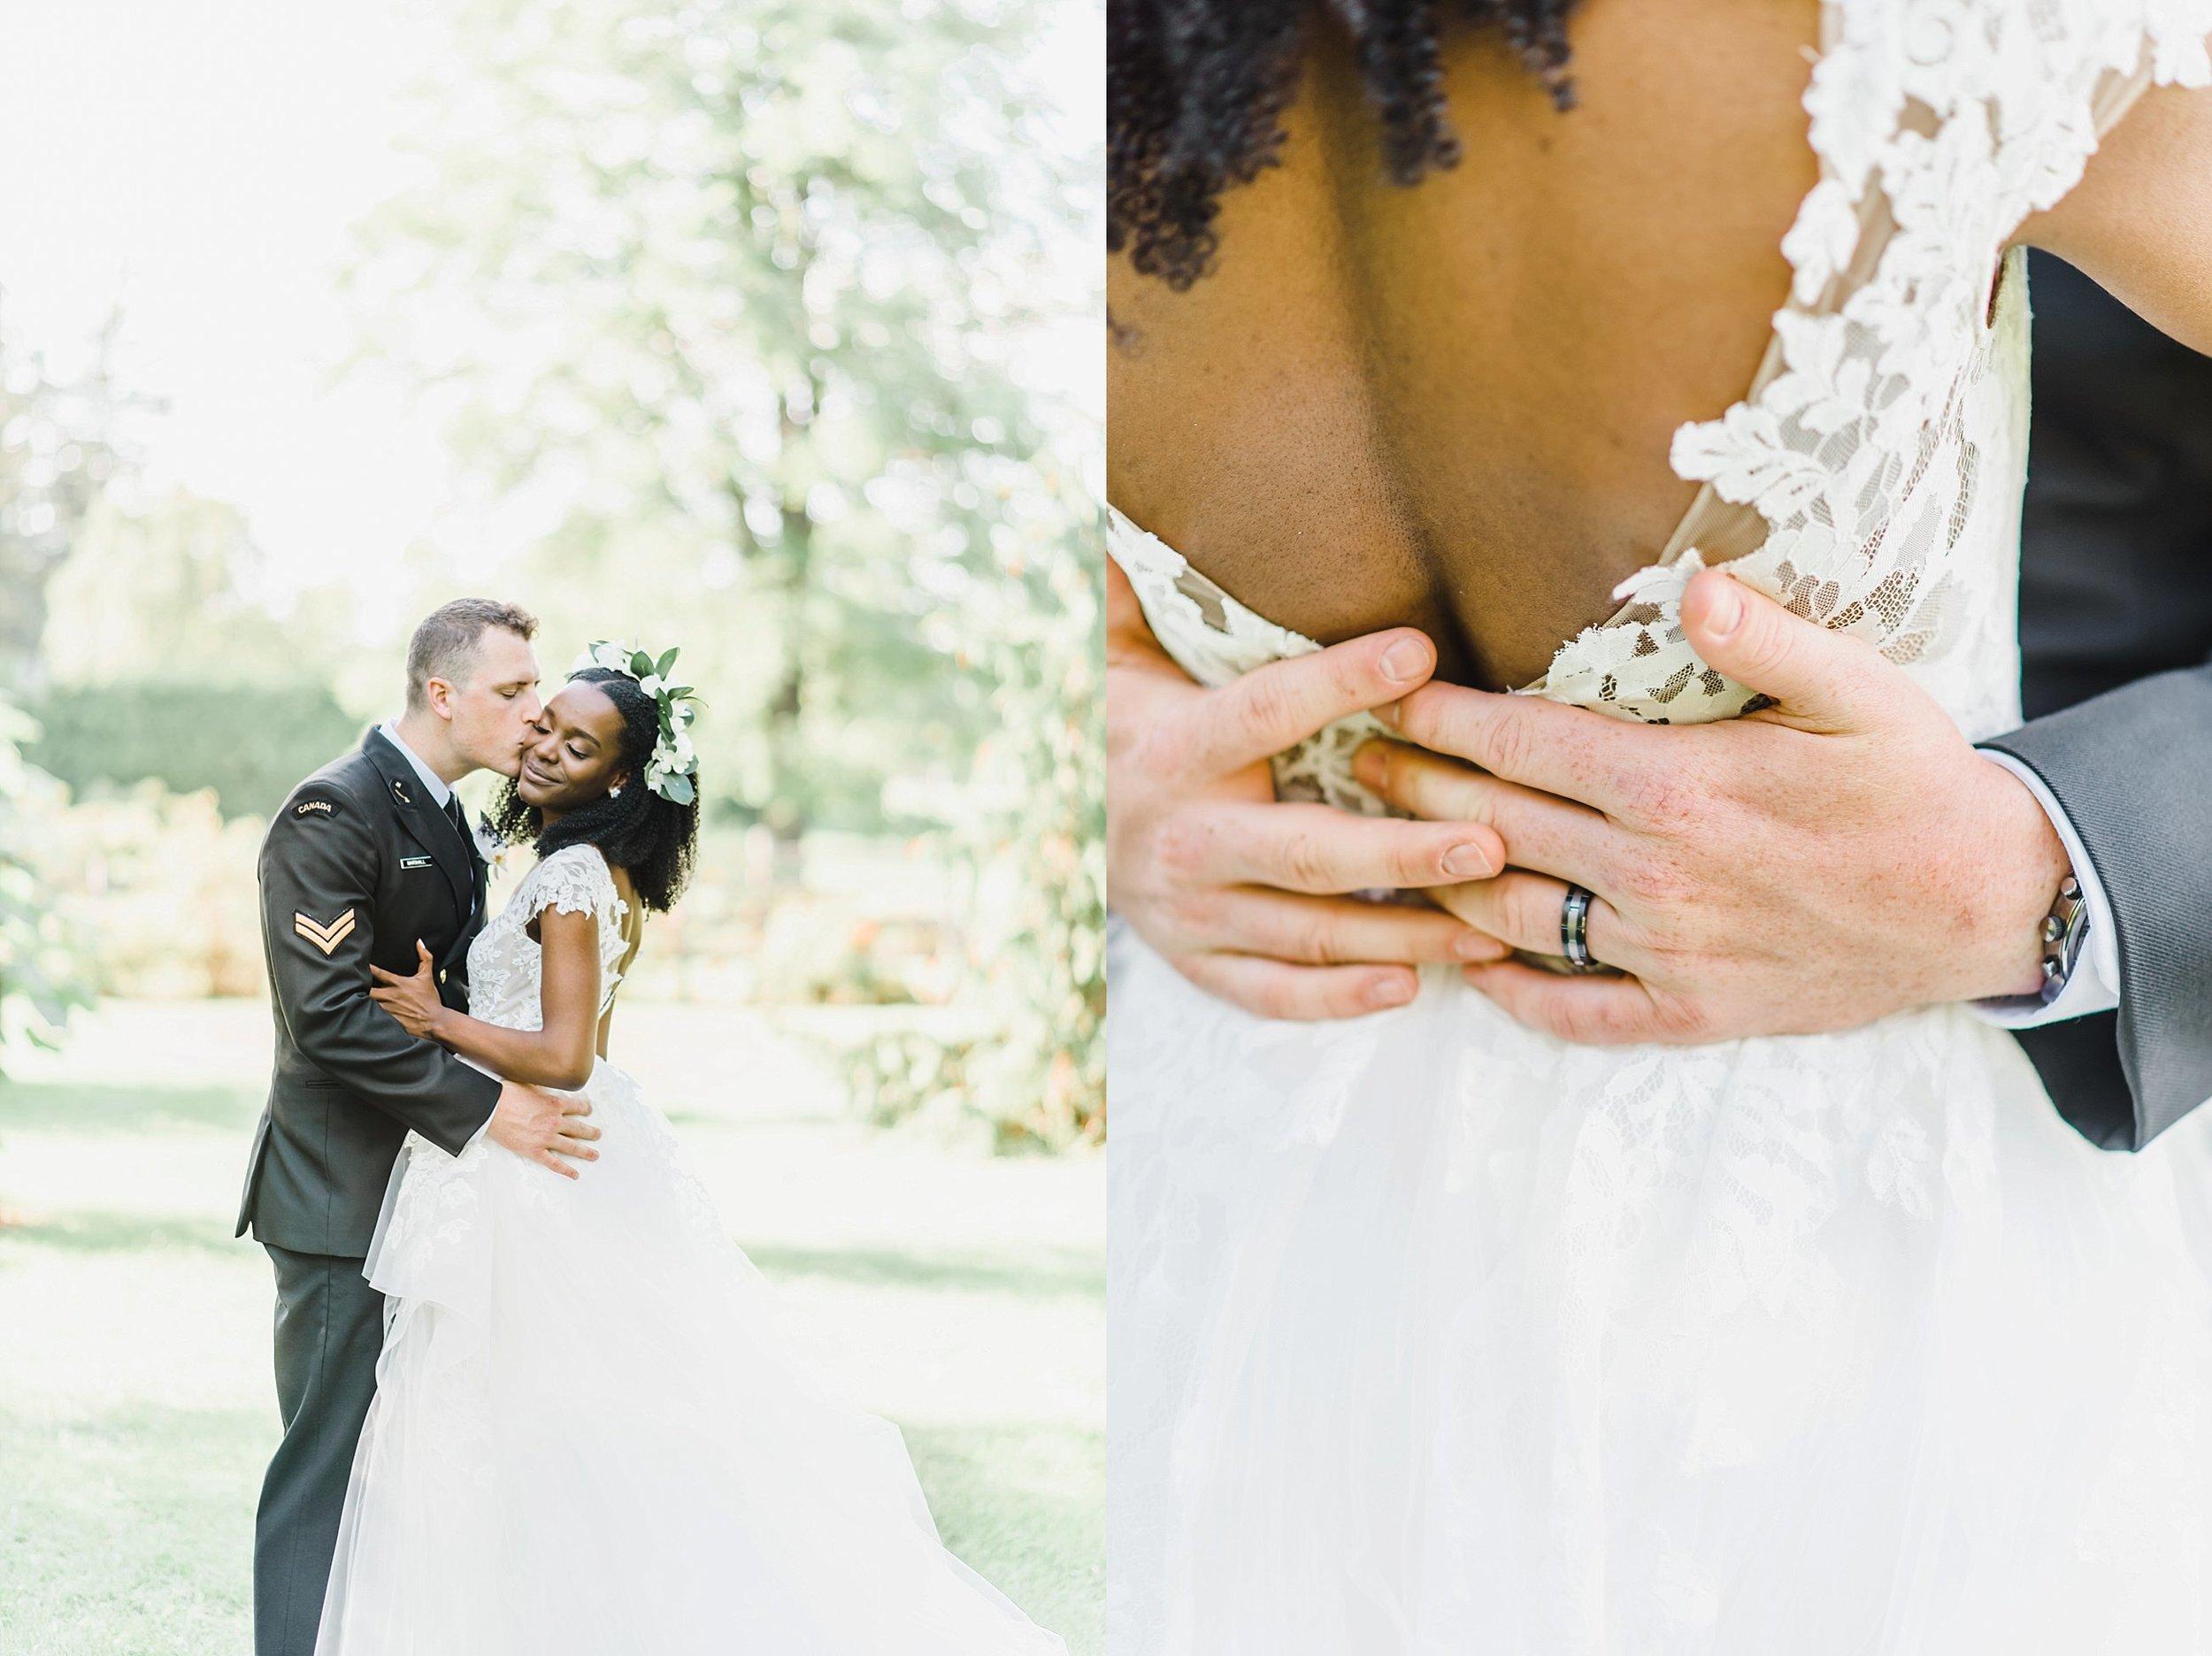 light airy indie fine art ottawa wedding photographer | Ali and Batoul Photography_0998.jpg